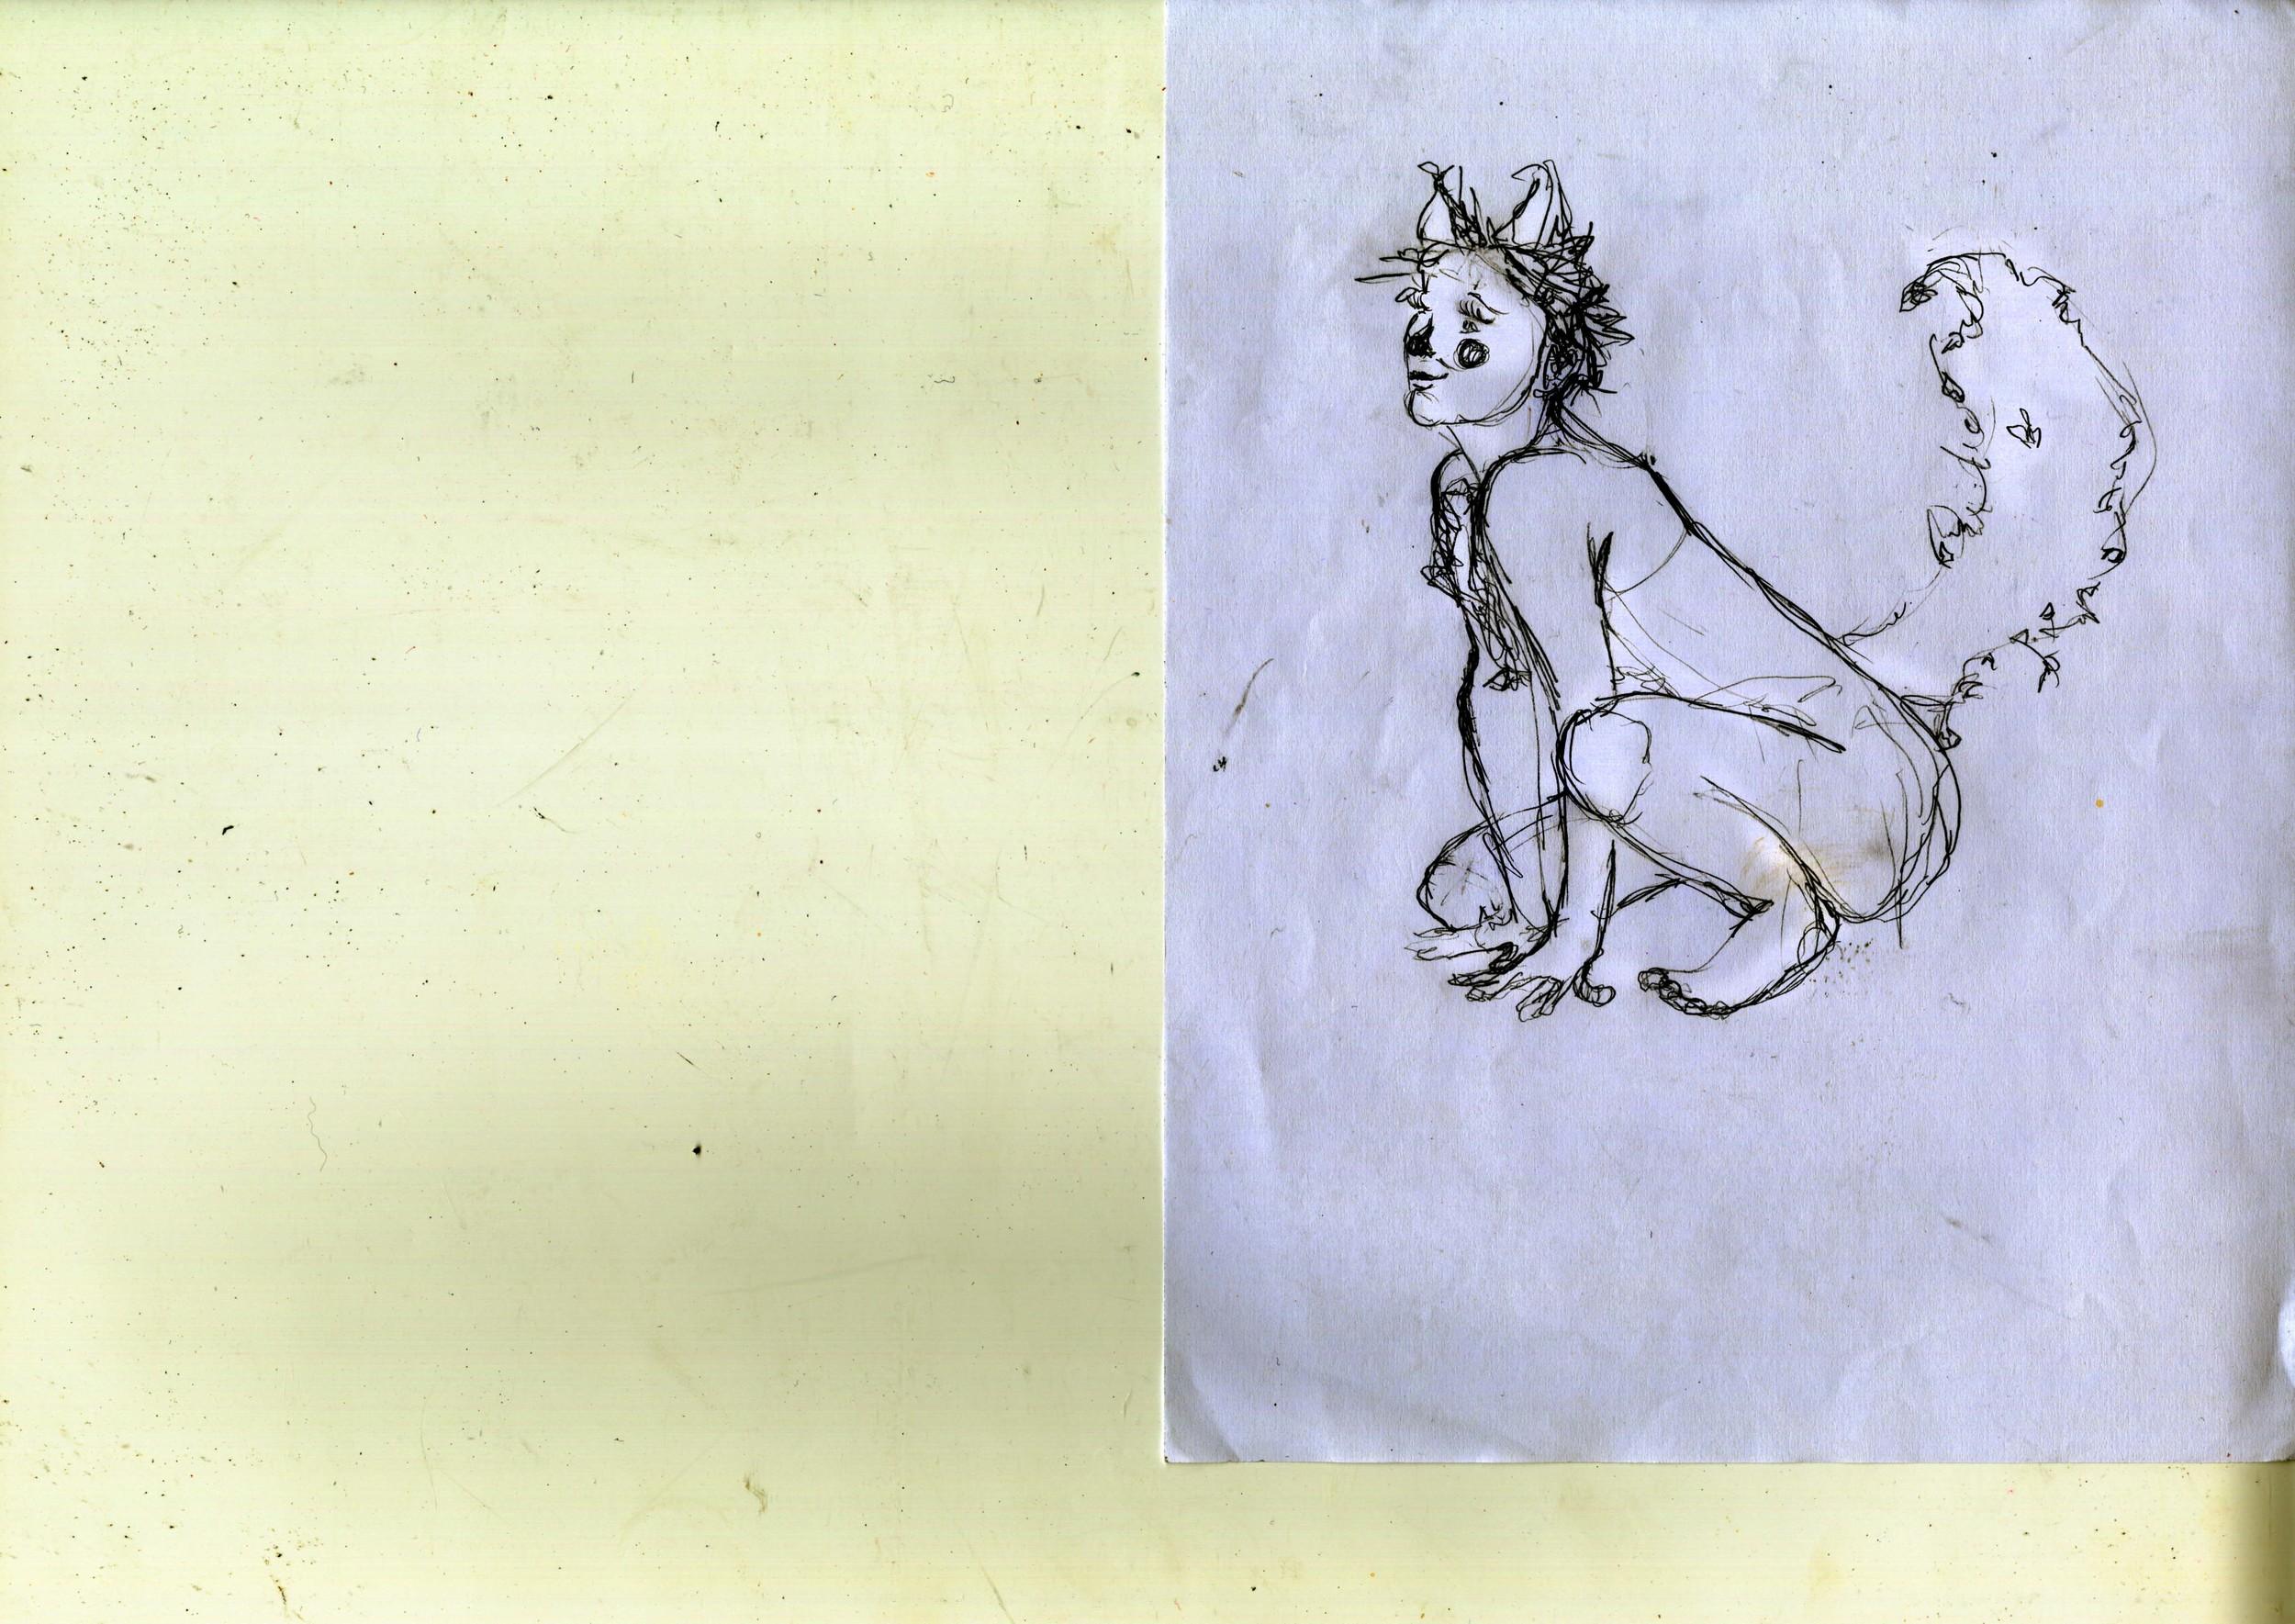 The Fox Sketch